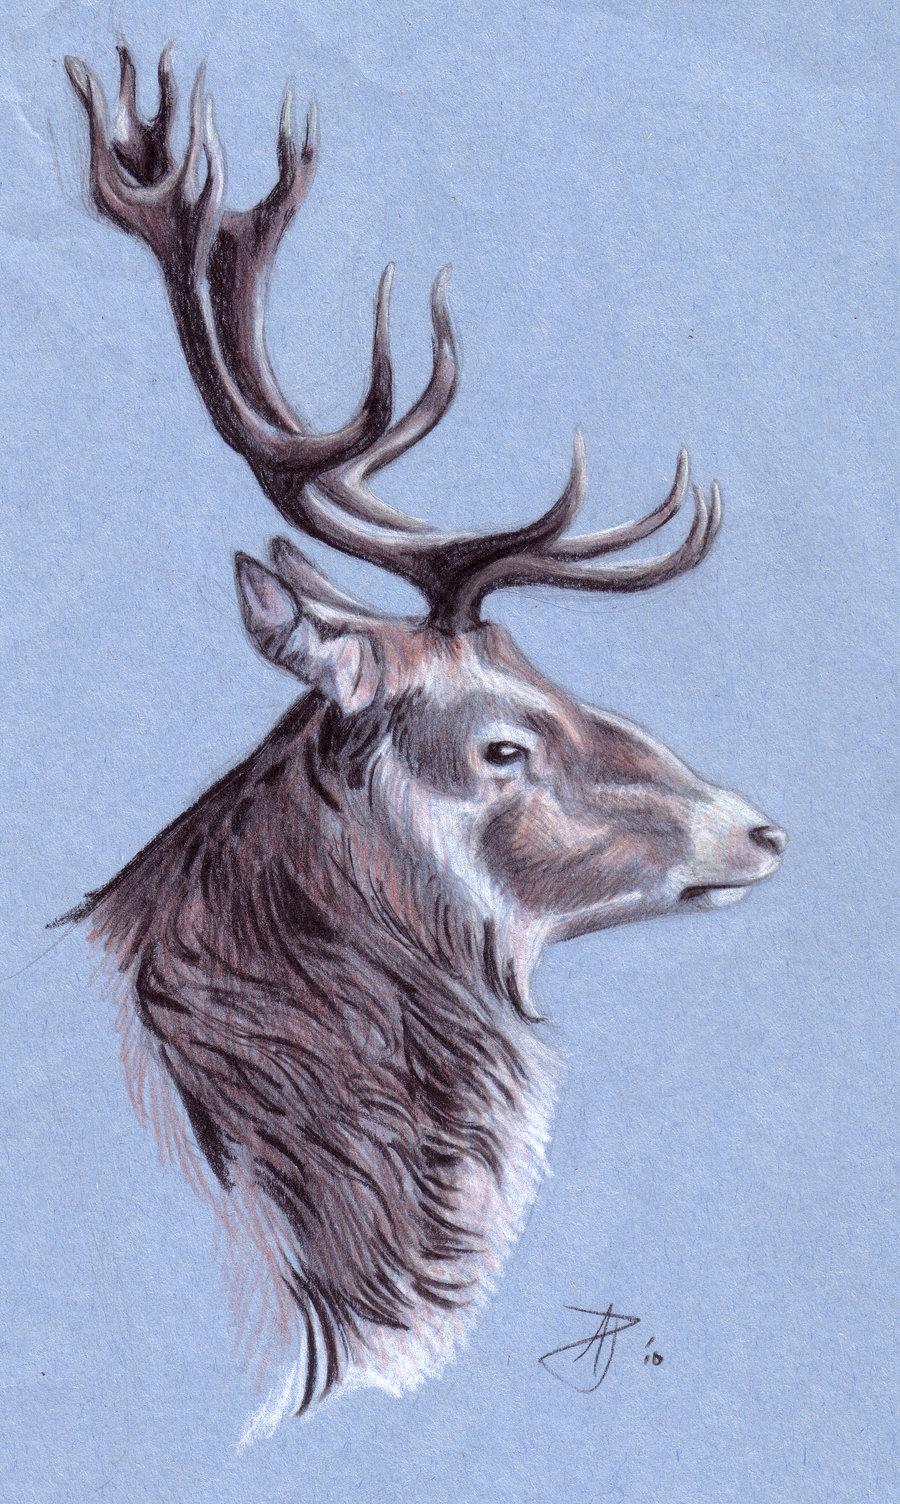 Drawn stag profile Ishkamoo DeviantArt Stag vamphawkeh on